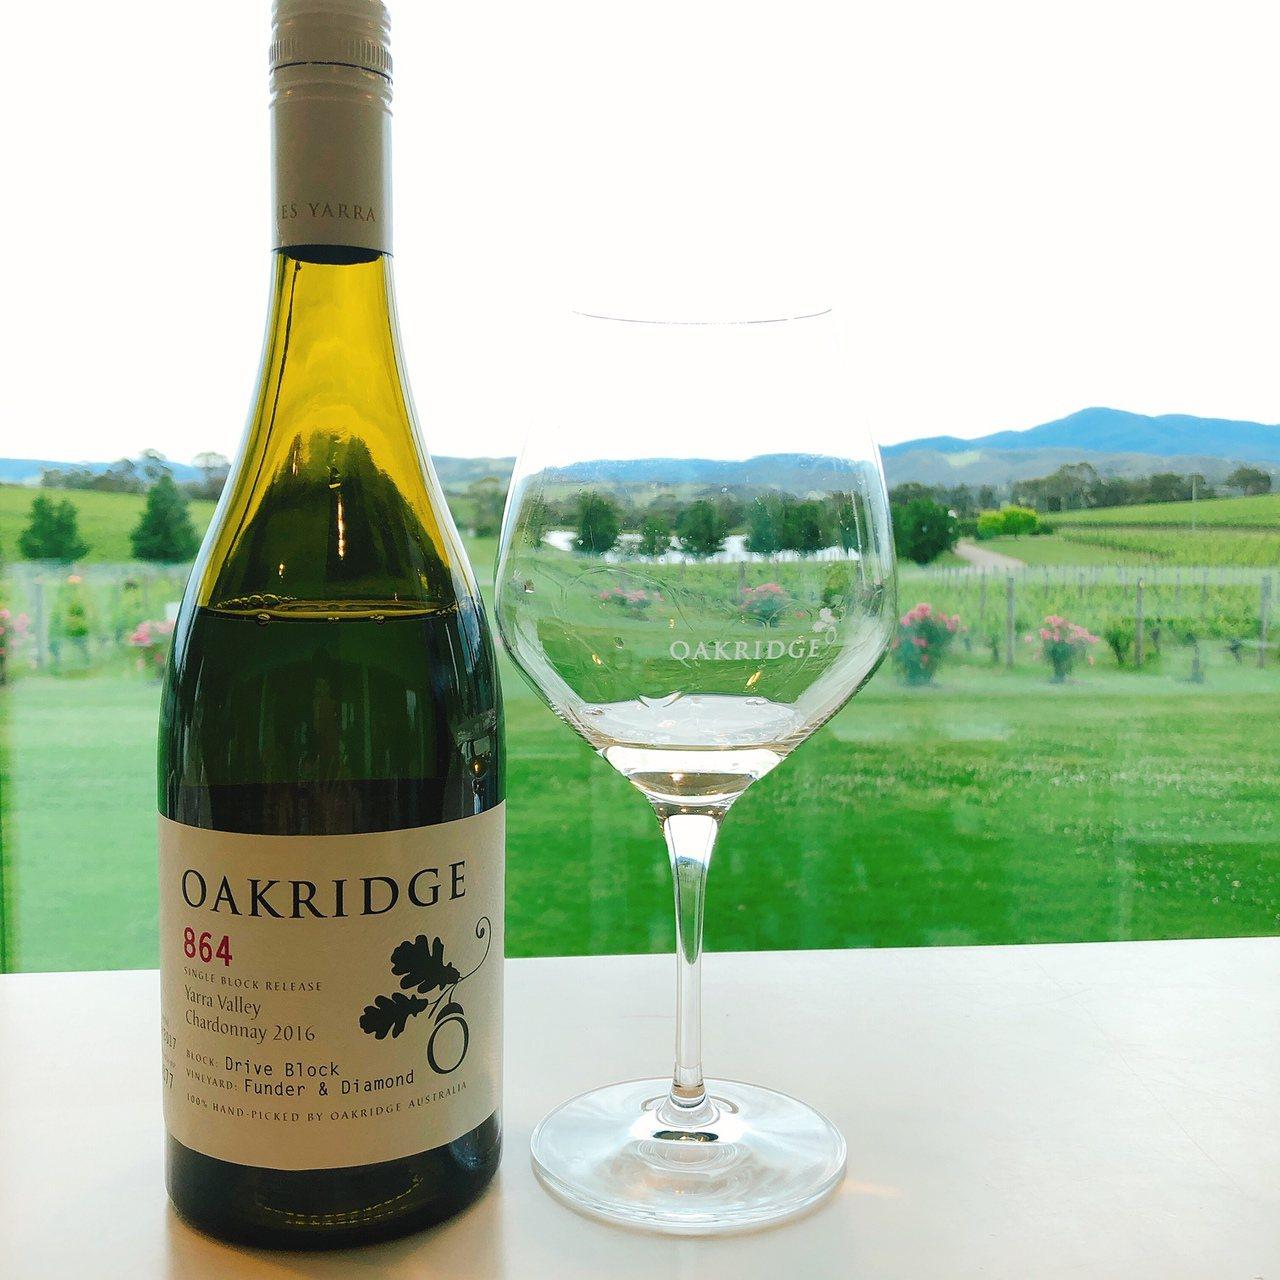 Oakridge酒莊品酒吧台望去,成排整齊葡萄樹與前導玫瑰。記者錢欽青攝影。 ...